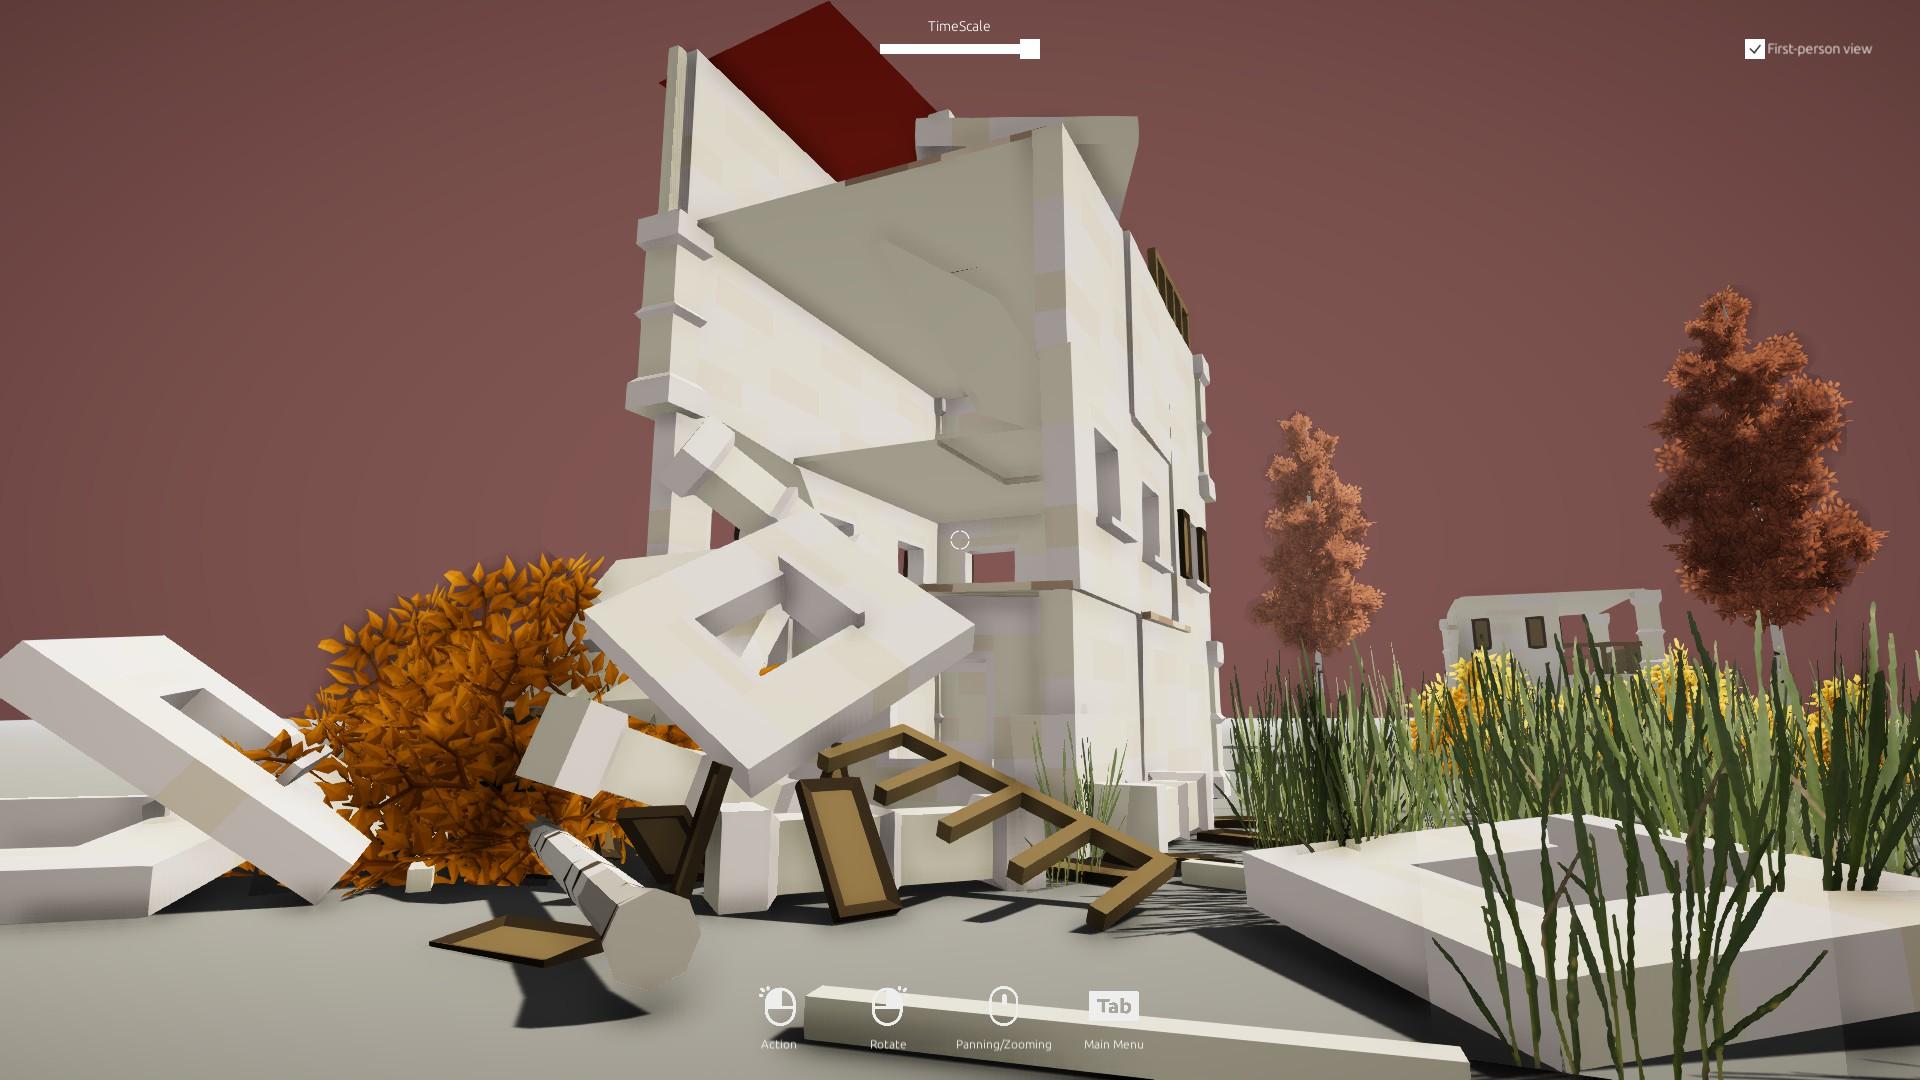 Art Of Destruction Steam Next Fest Simulator Demo Building 1